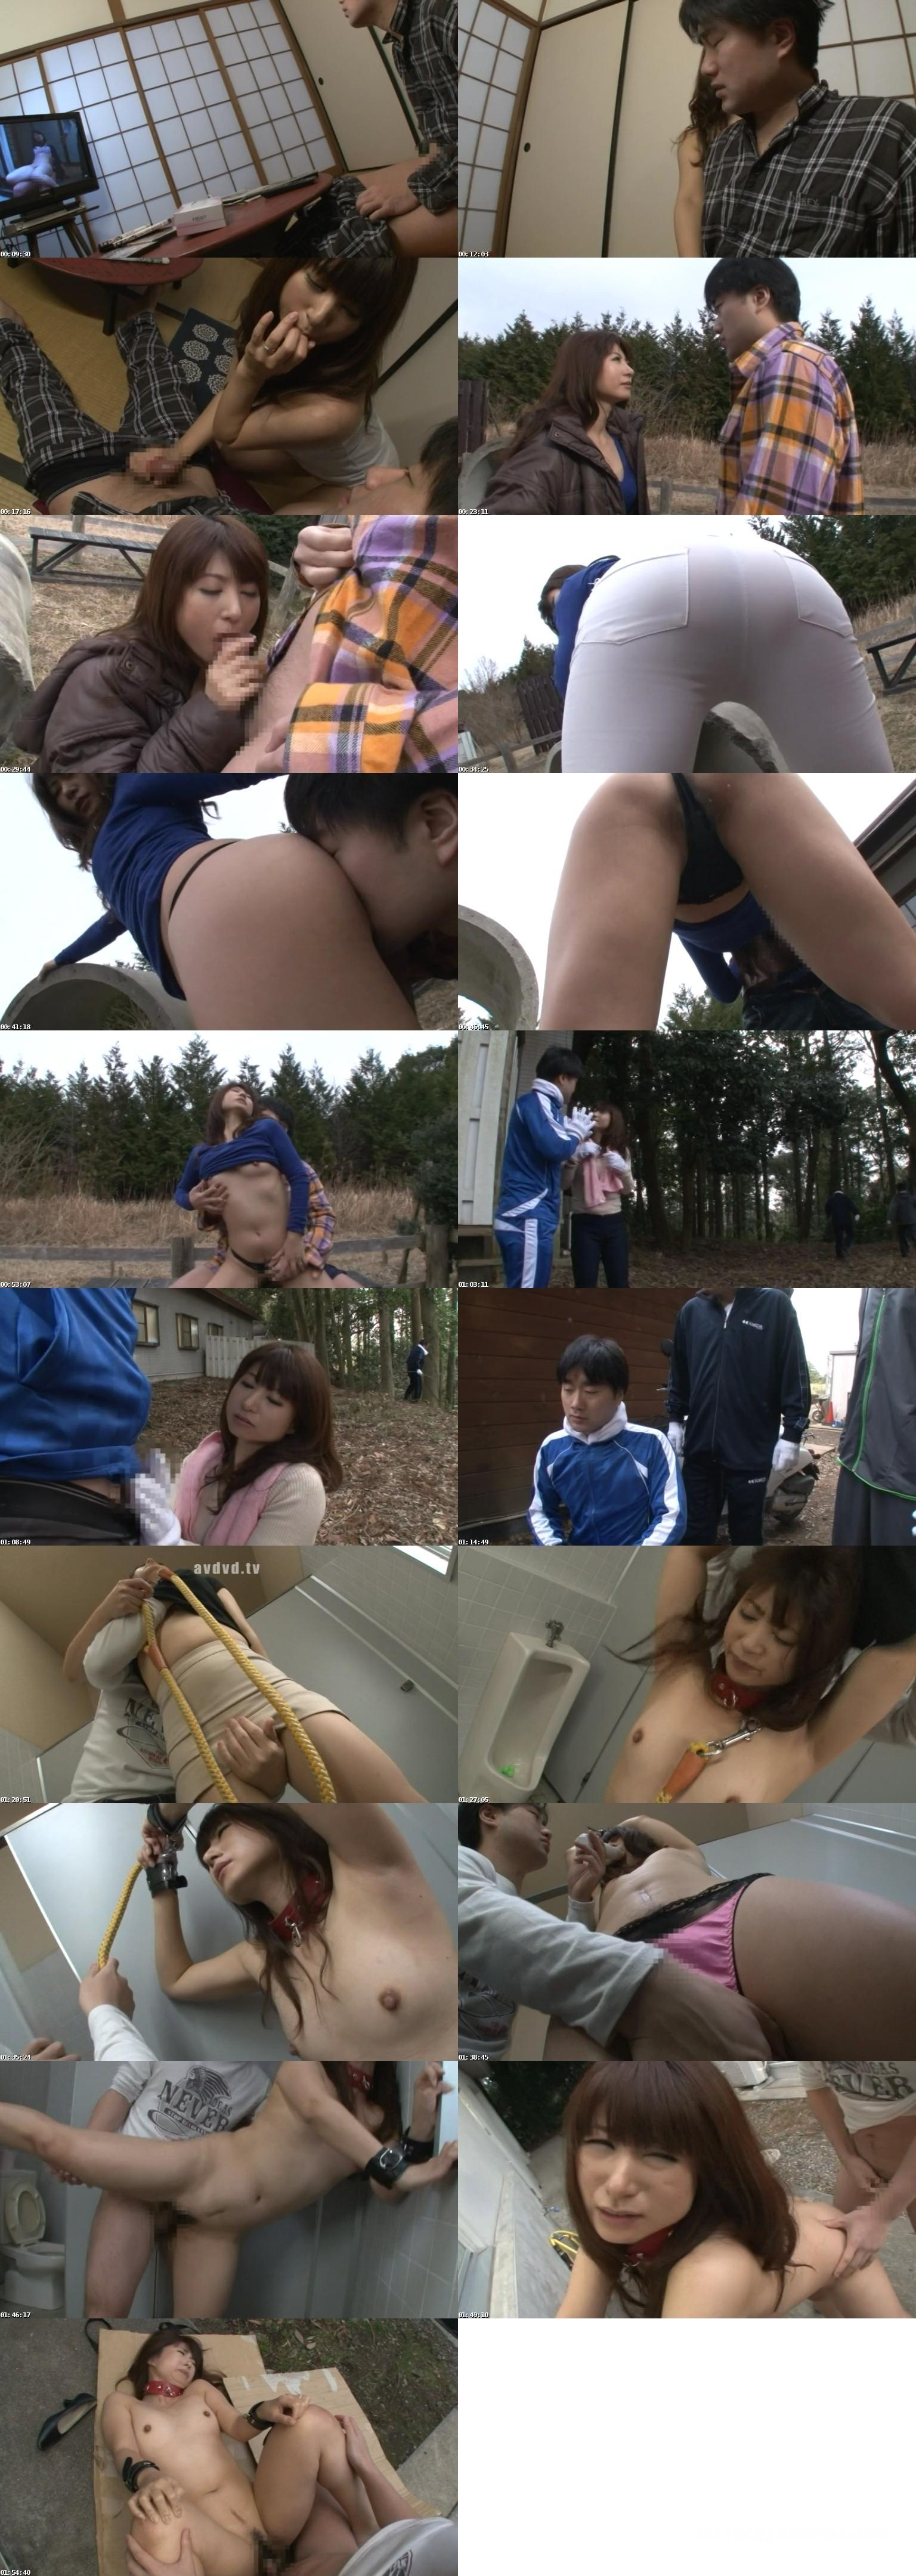 [ARWA 025] 野外で僕を悩殺する露出狂の母 菅原直美 菅原直美 ARWA